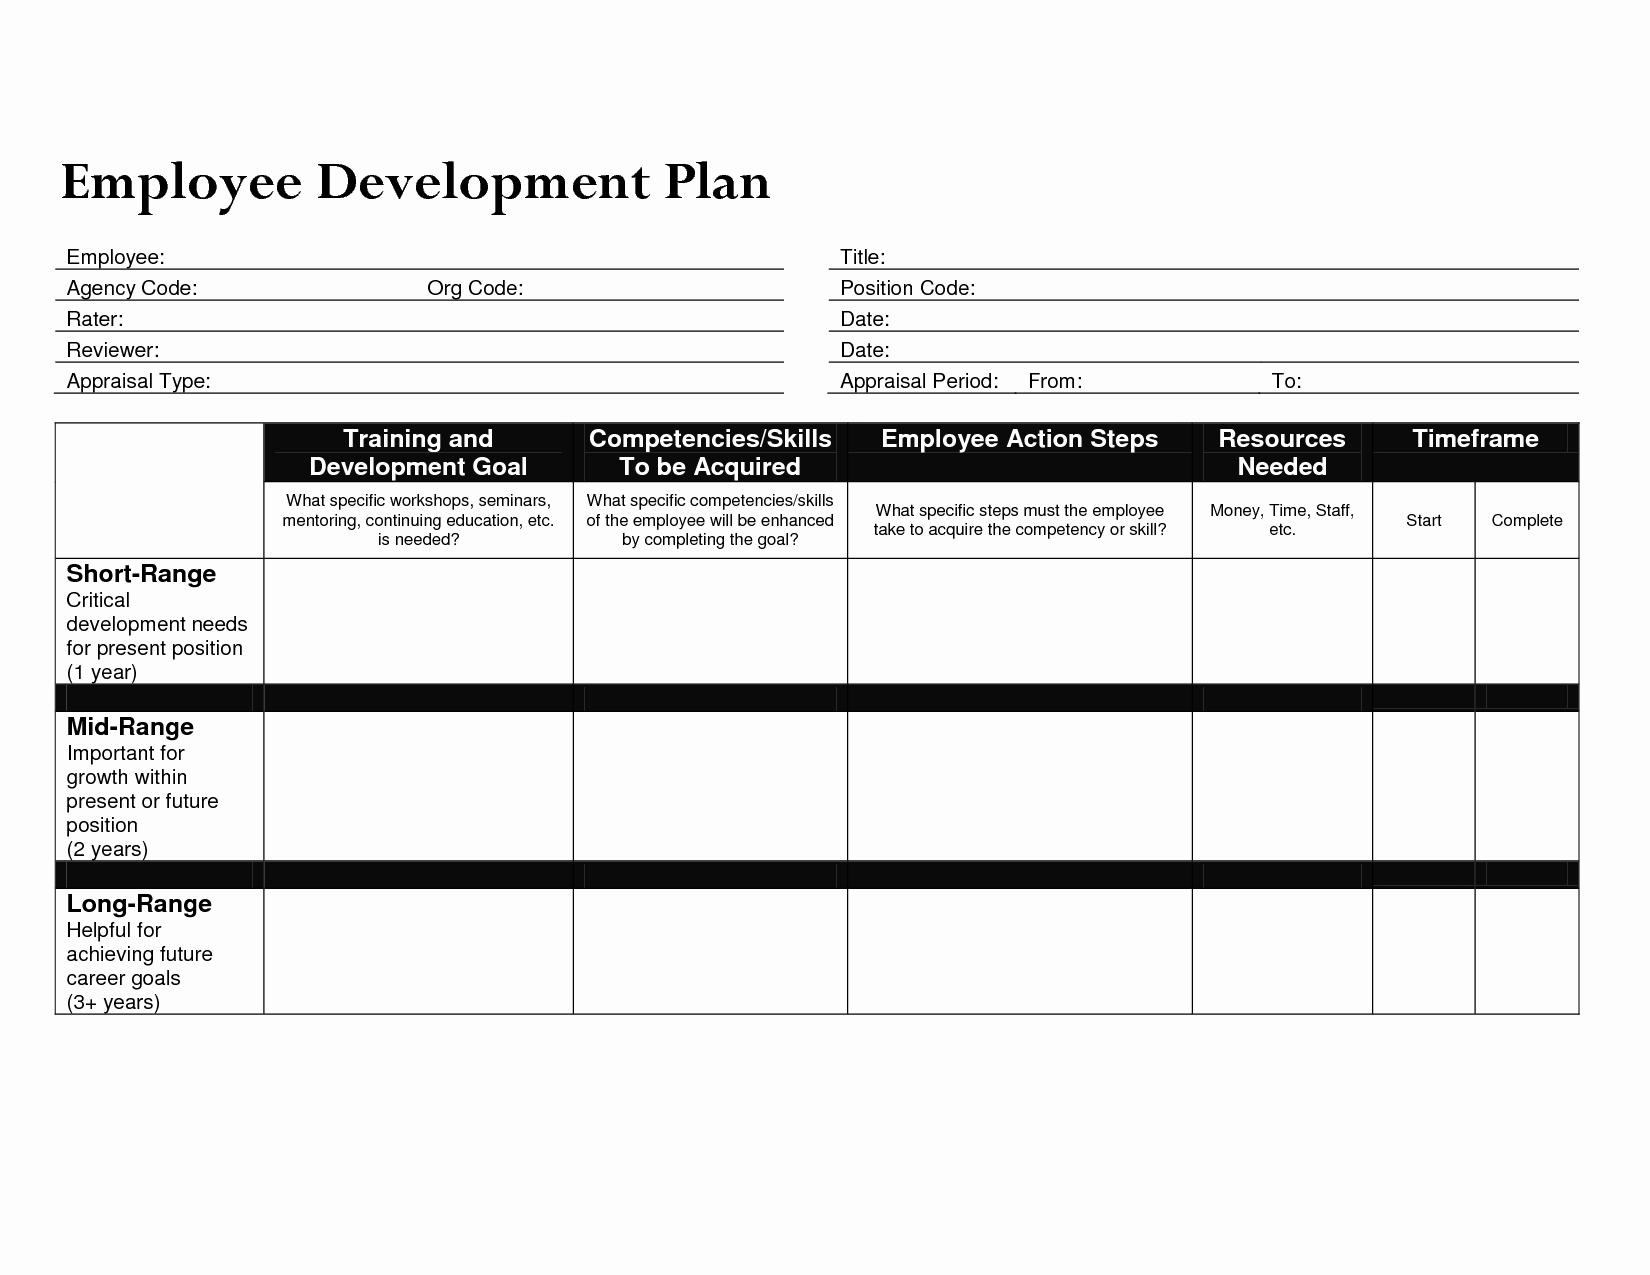 Development Plan Template Word Best Of Development Plan Template for Employees